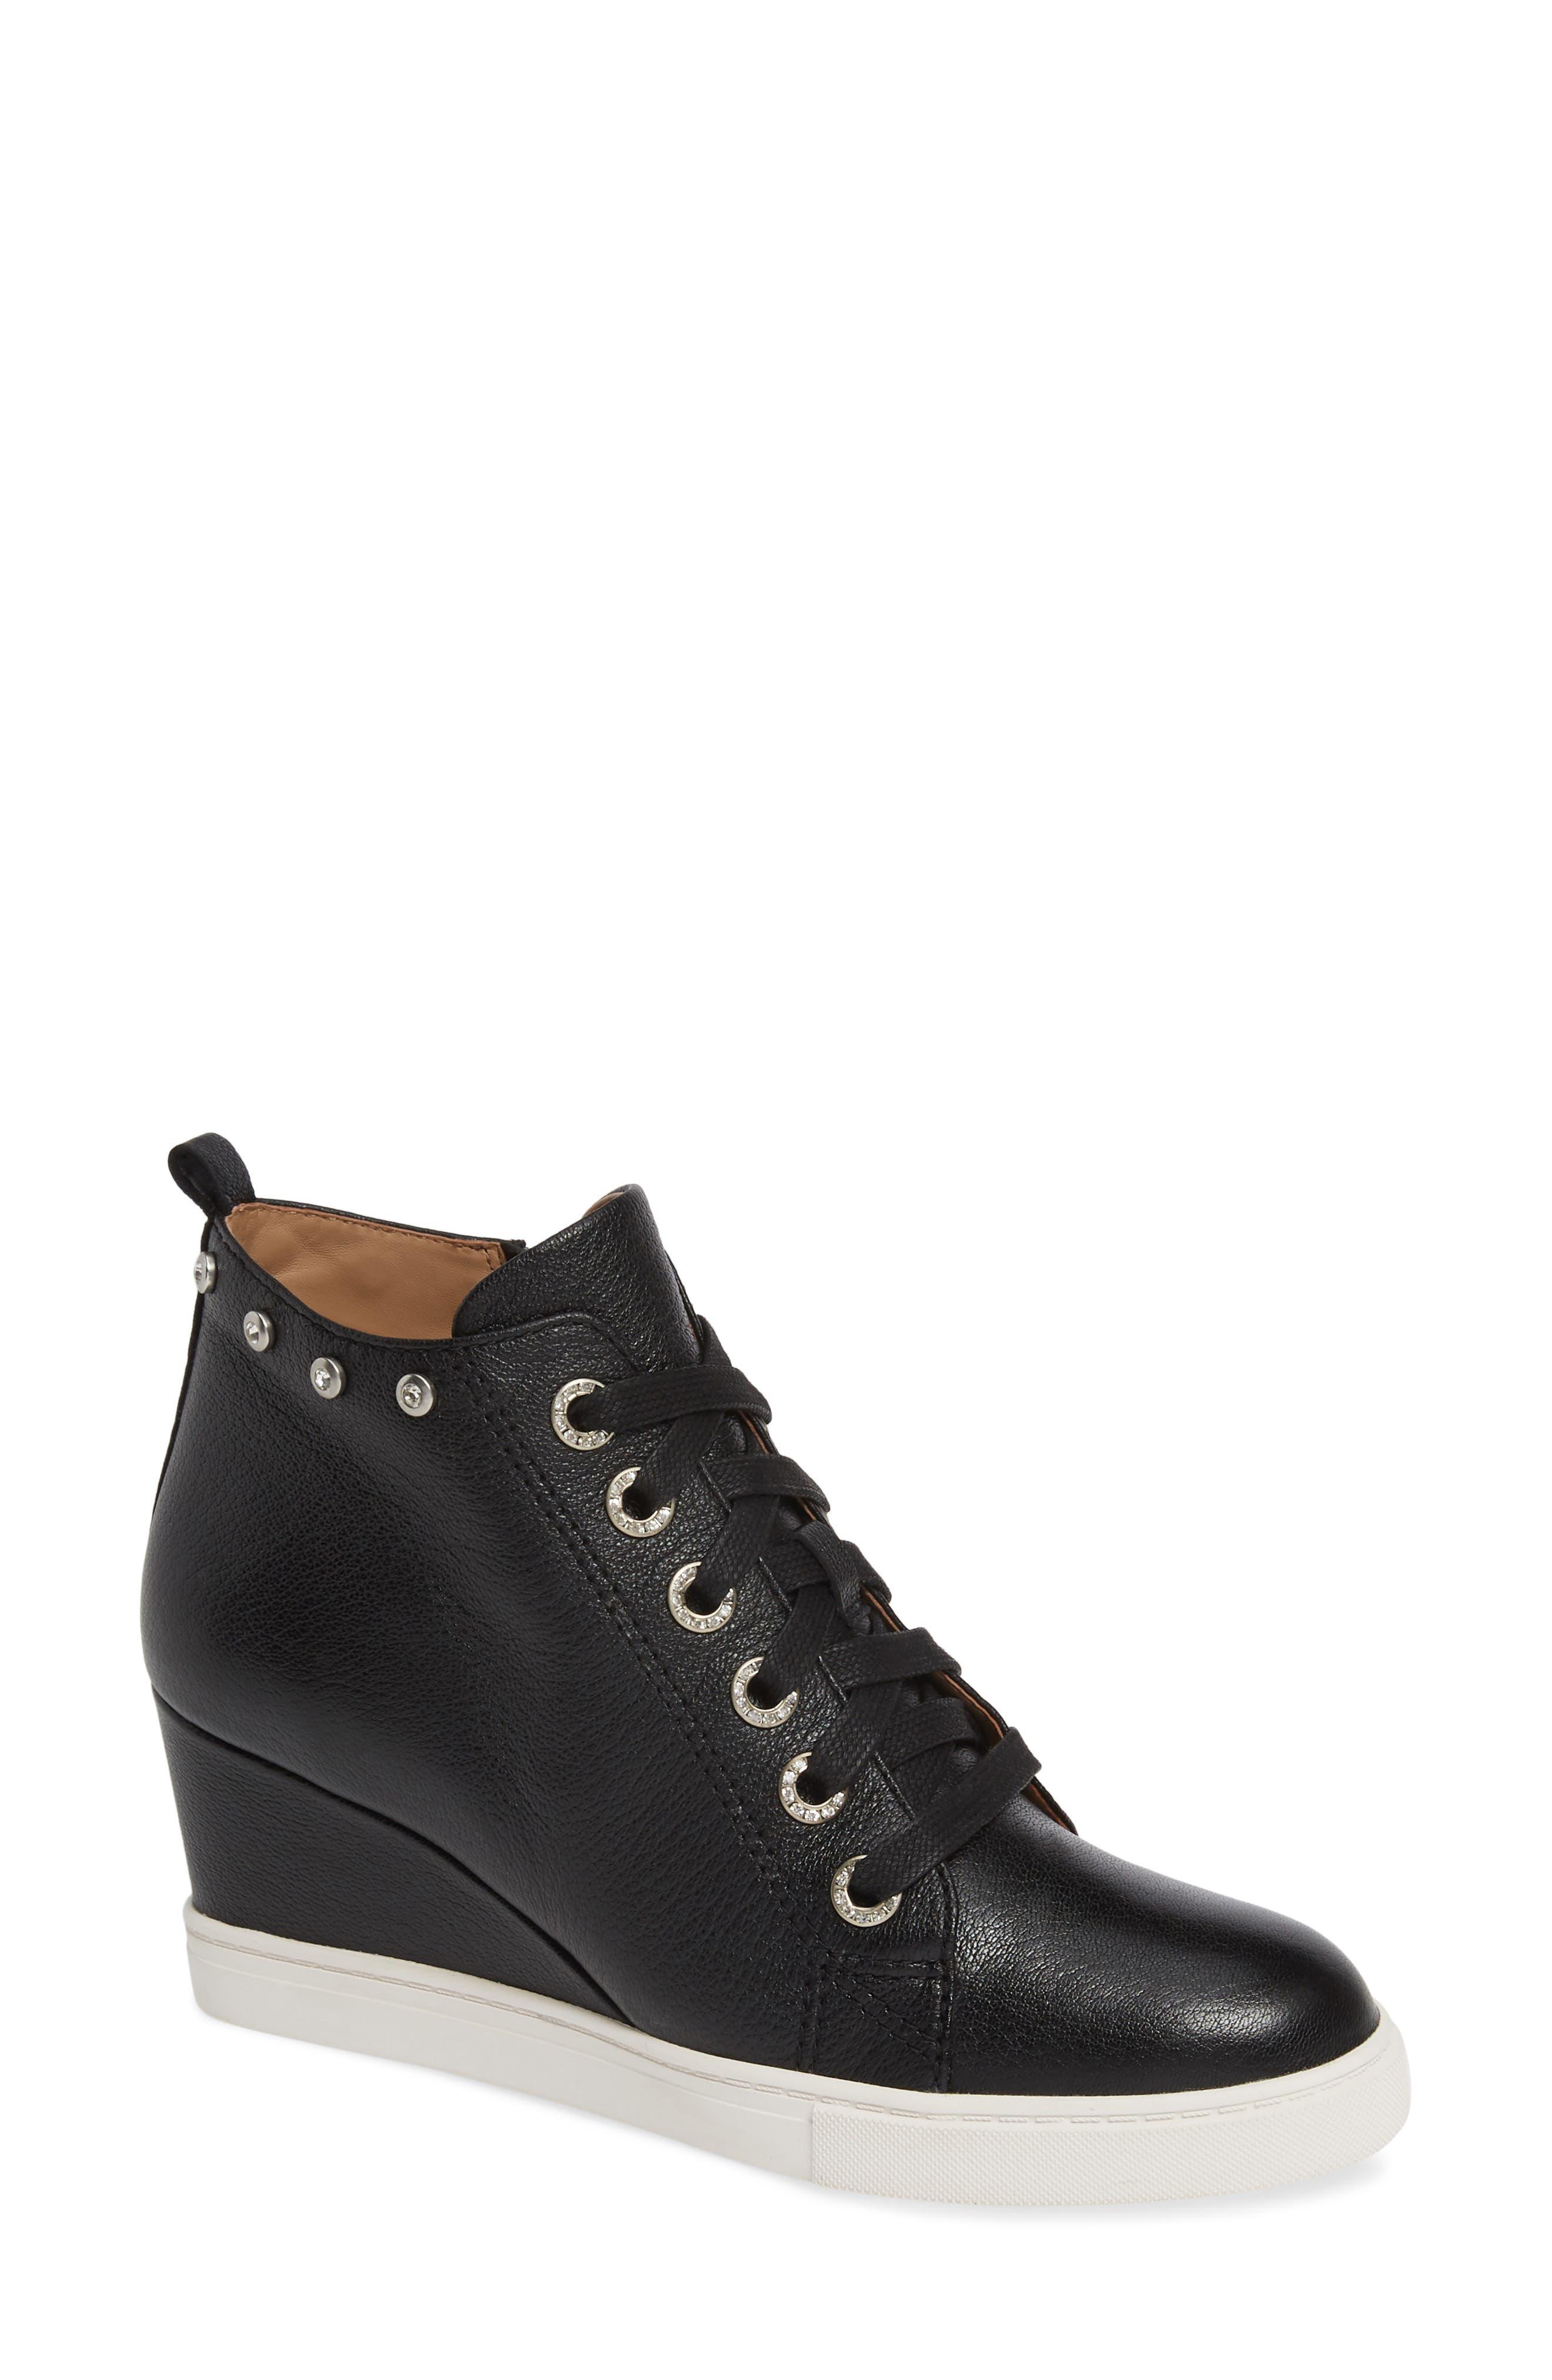 LINEA PAOLO, Flint Wedge Sneaker, Main thumbnail 1, color, BLACK LEATHER